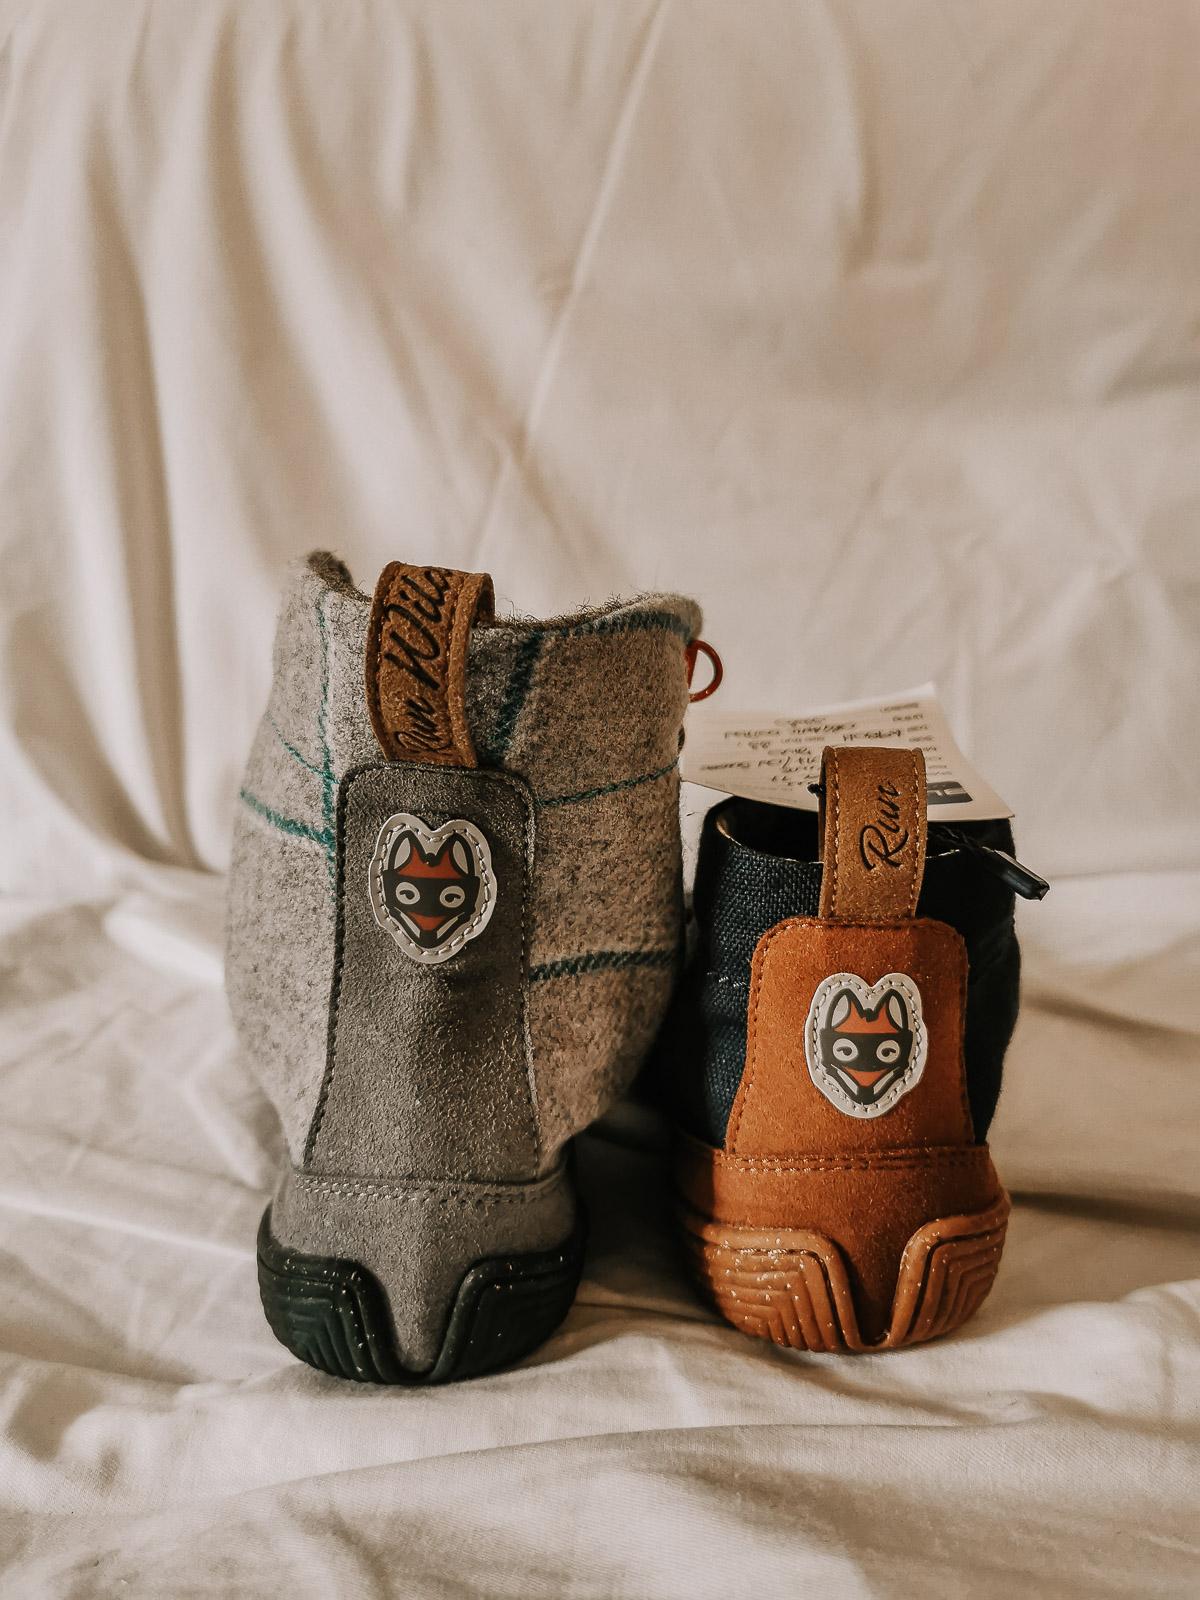 Wildling, Minimalschuhe, Wildling Schuhe, Wildling Köln, Wildling Minimalschuhe, Fair Fashion Minimalschuhe, Minimalschuhe Faire Mode, Fair Fashion Label